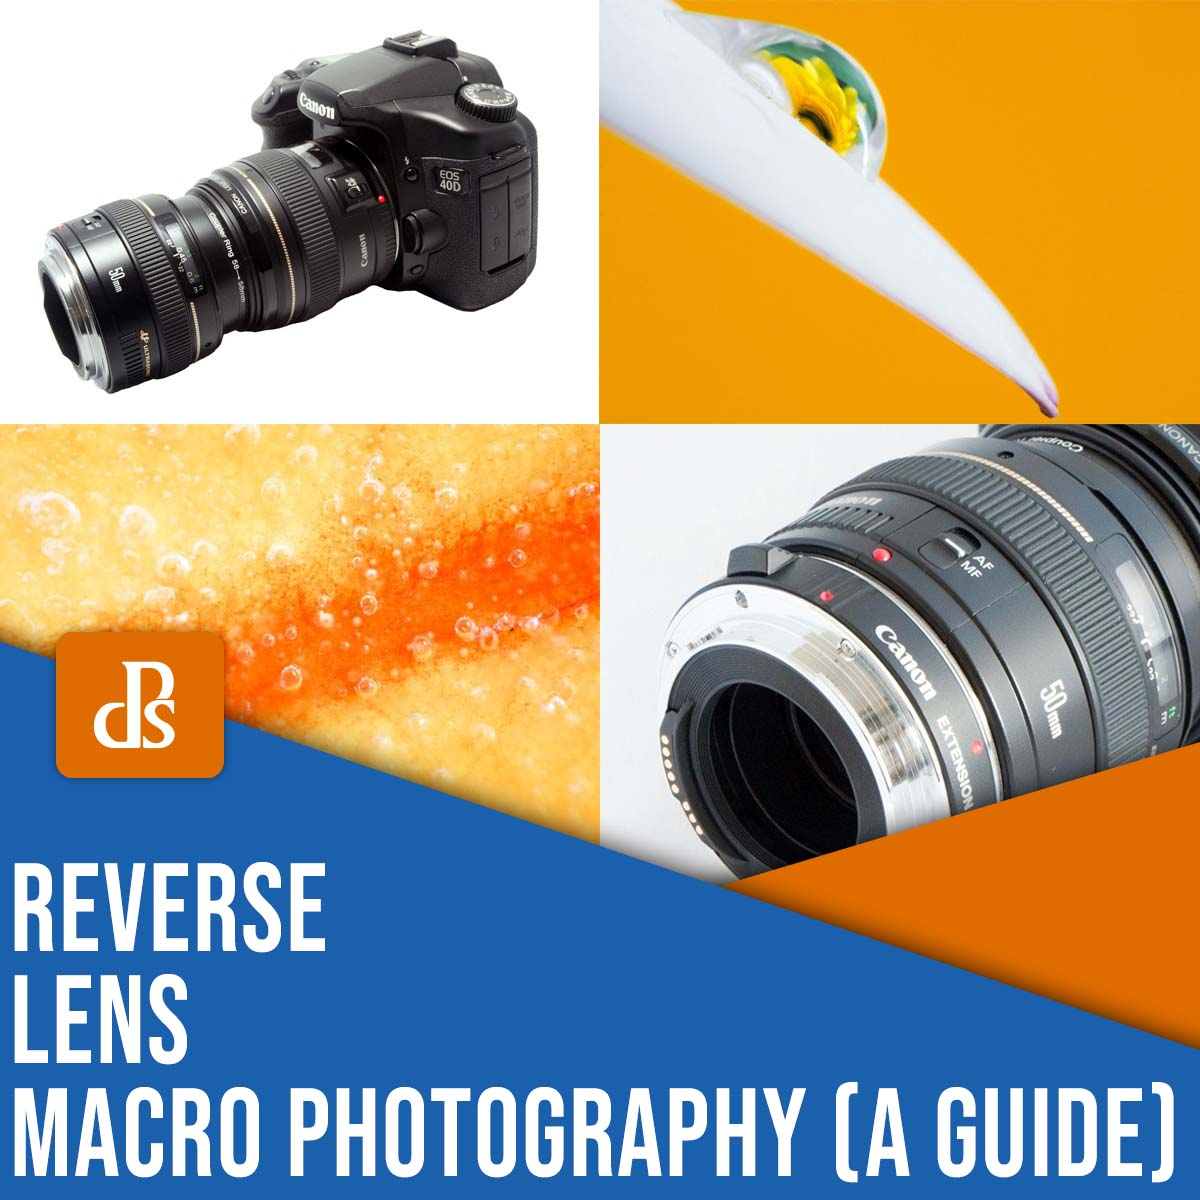 reverse lens macro photography: a guide